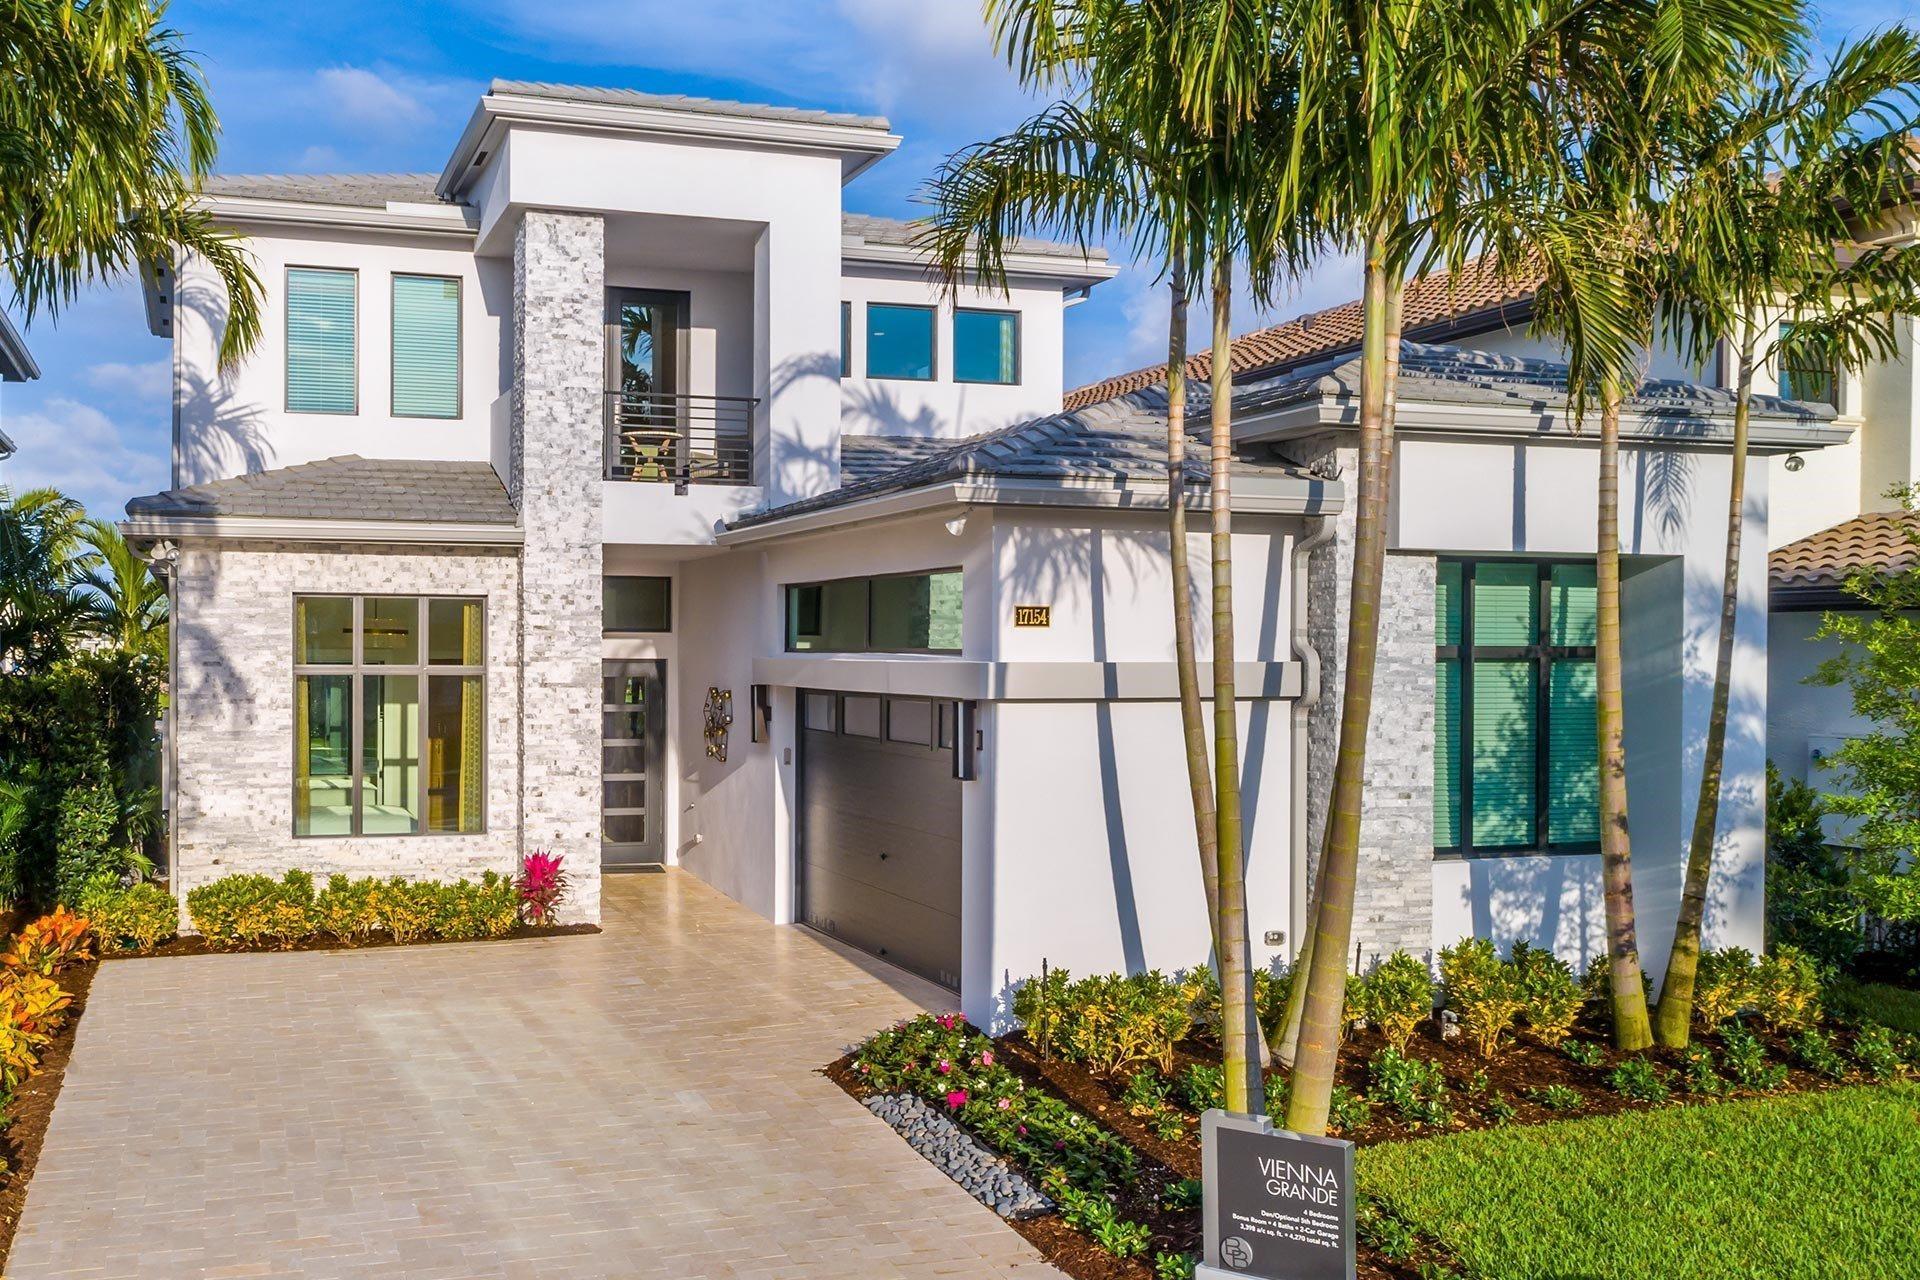 17370 Santaluce Manor Boca Raton, FL 33496